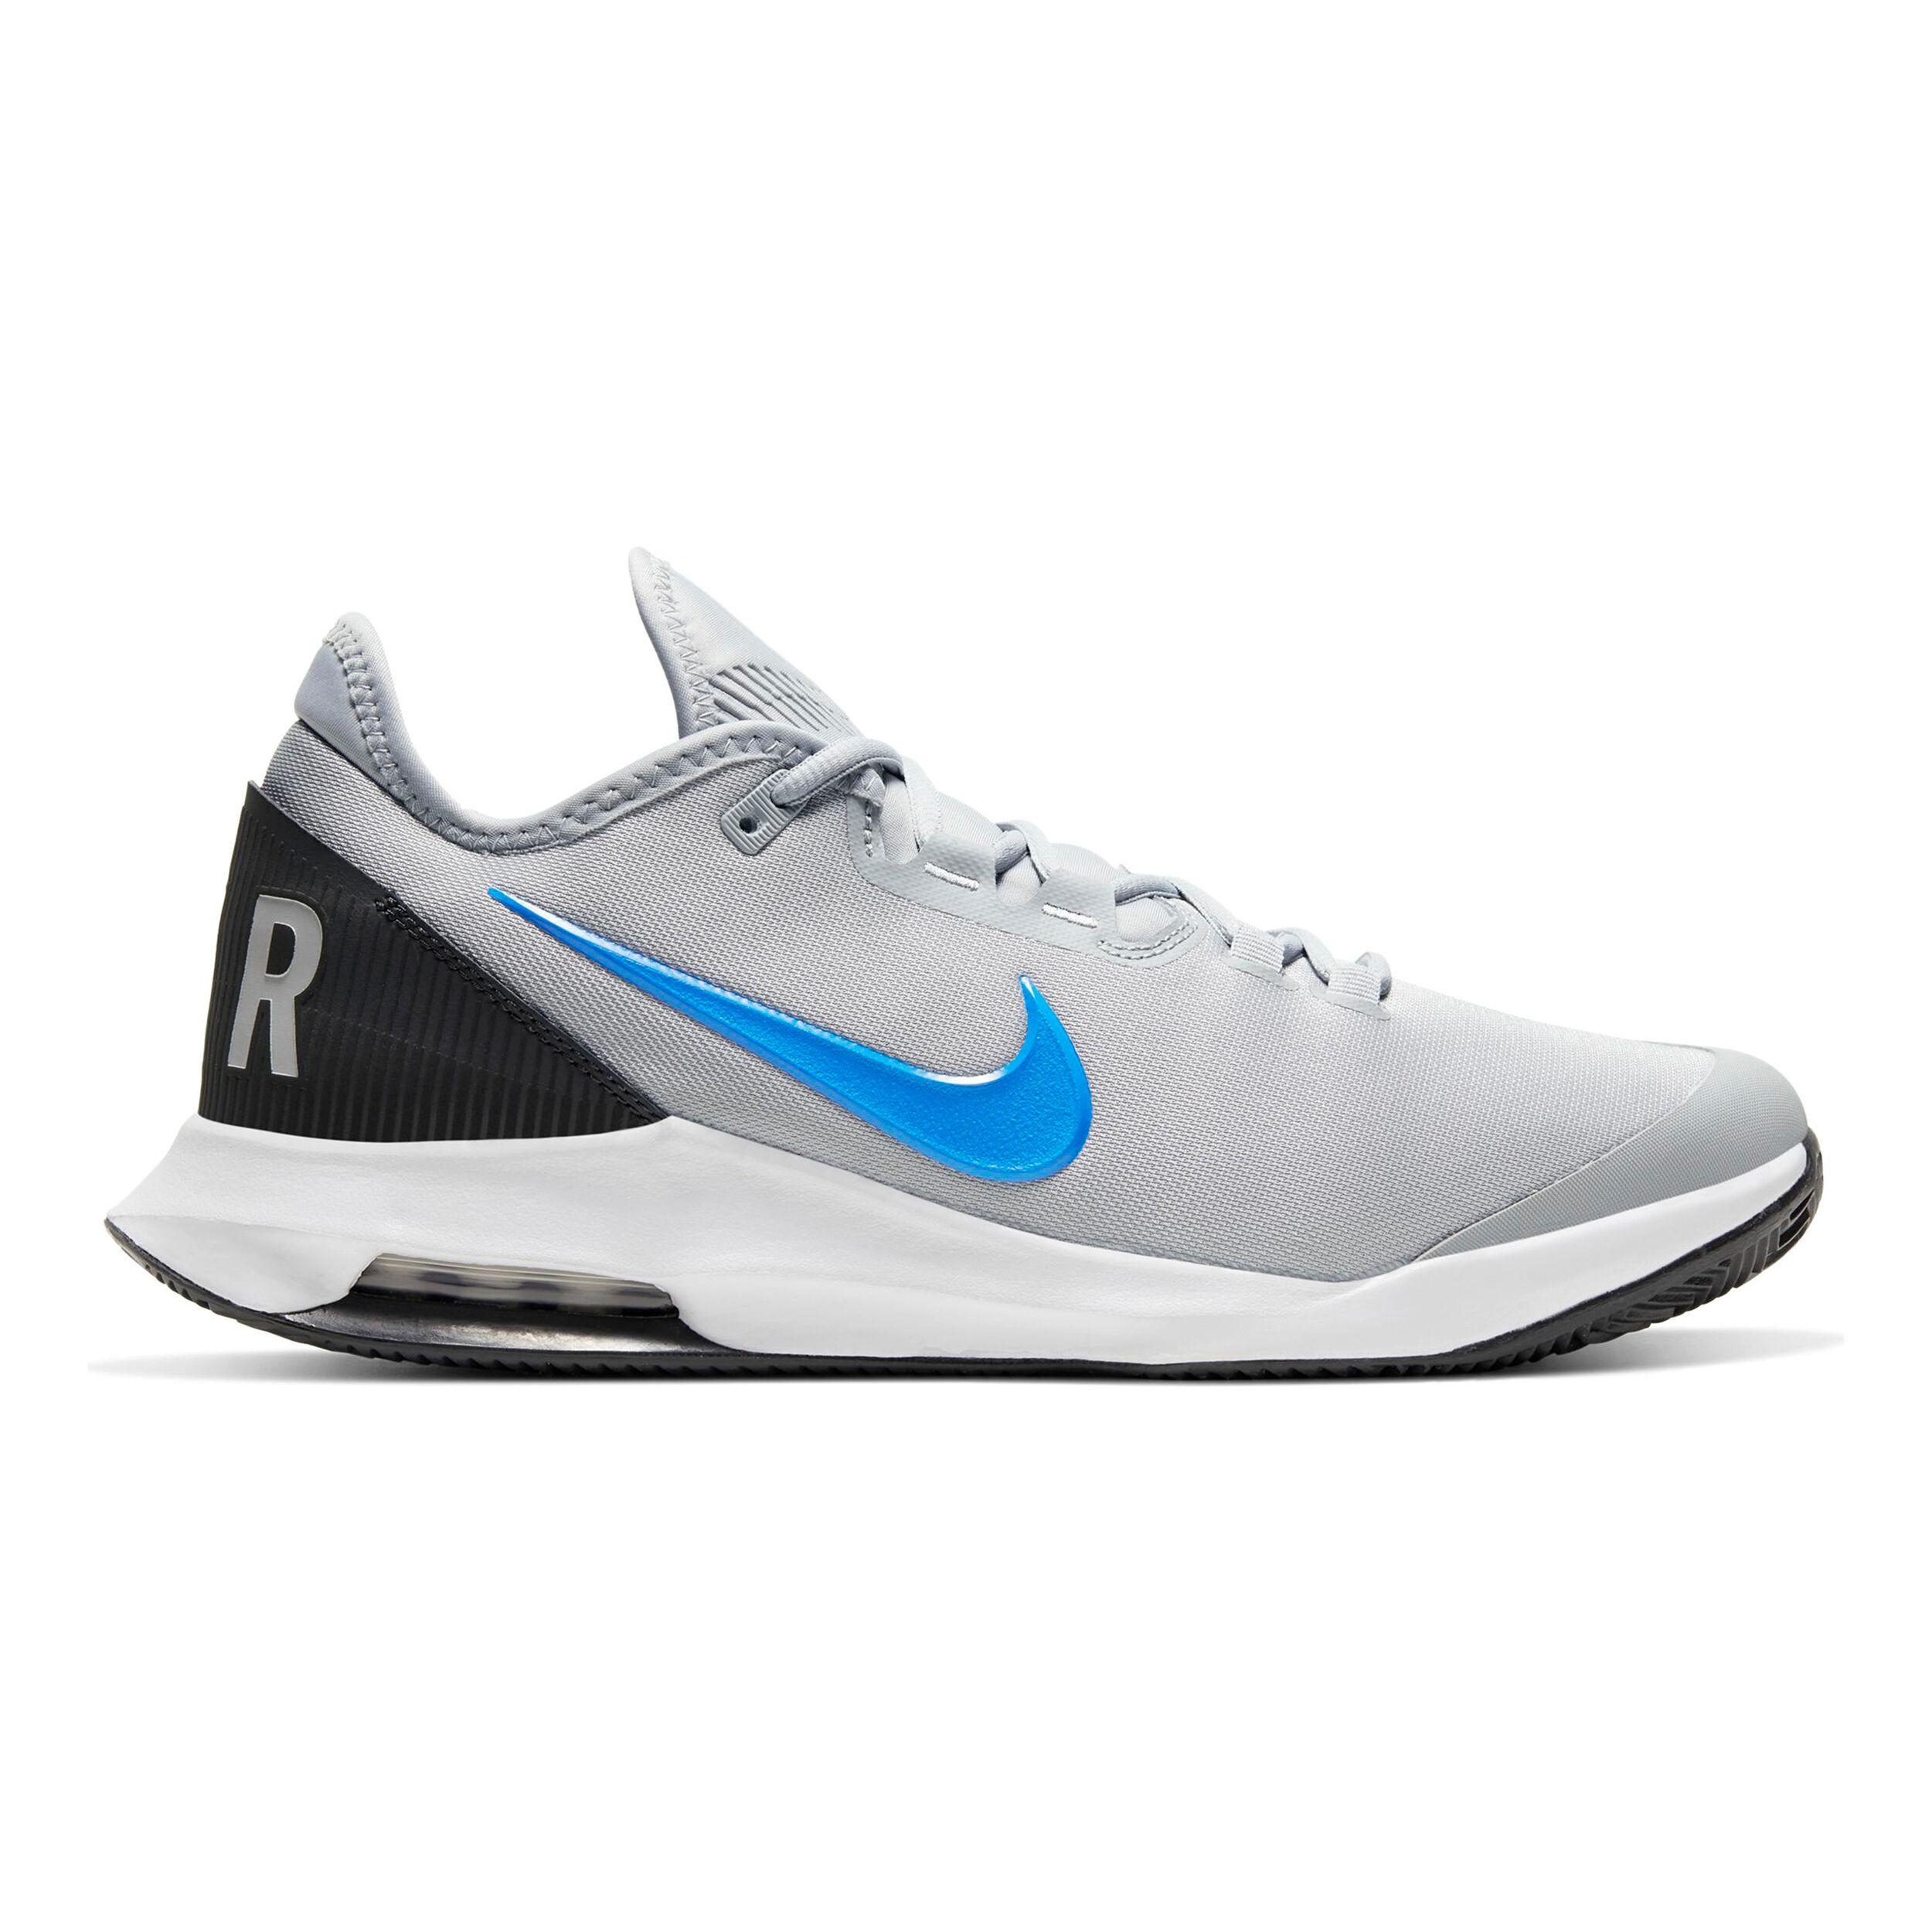 buy Nike Air Max Wildcard Clay Court Shoe Men - Grey, White online ...